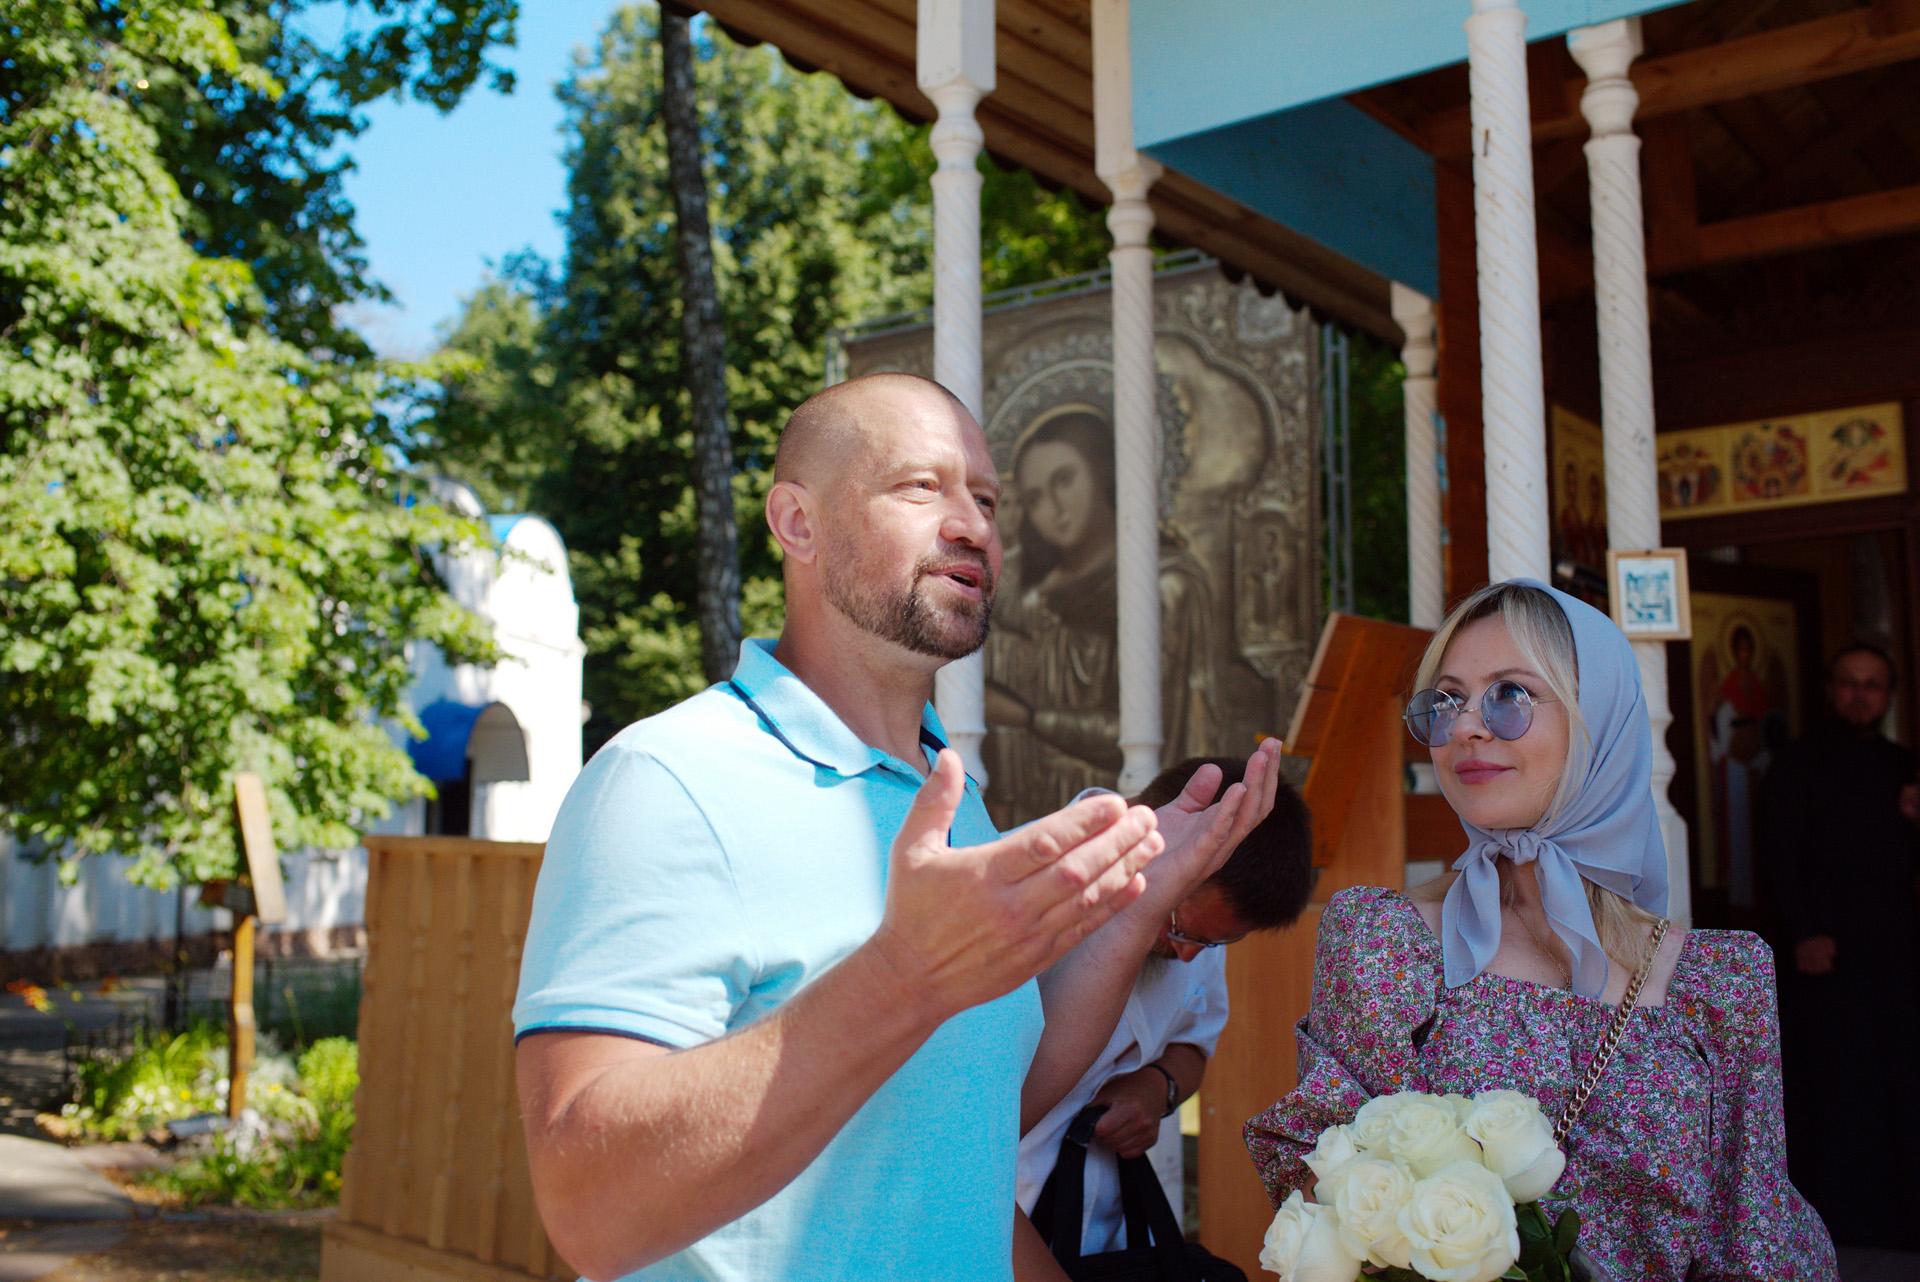 http://monuspen.ru/photoreports/63cee2eedb0b6f9799f6ffc103c27fba.jpg